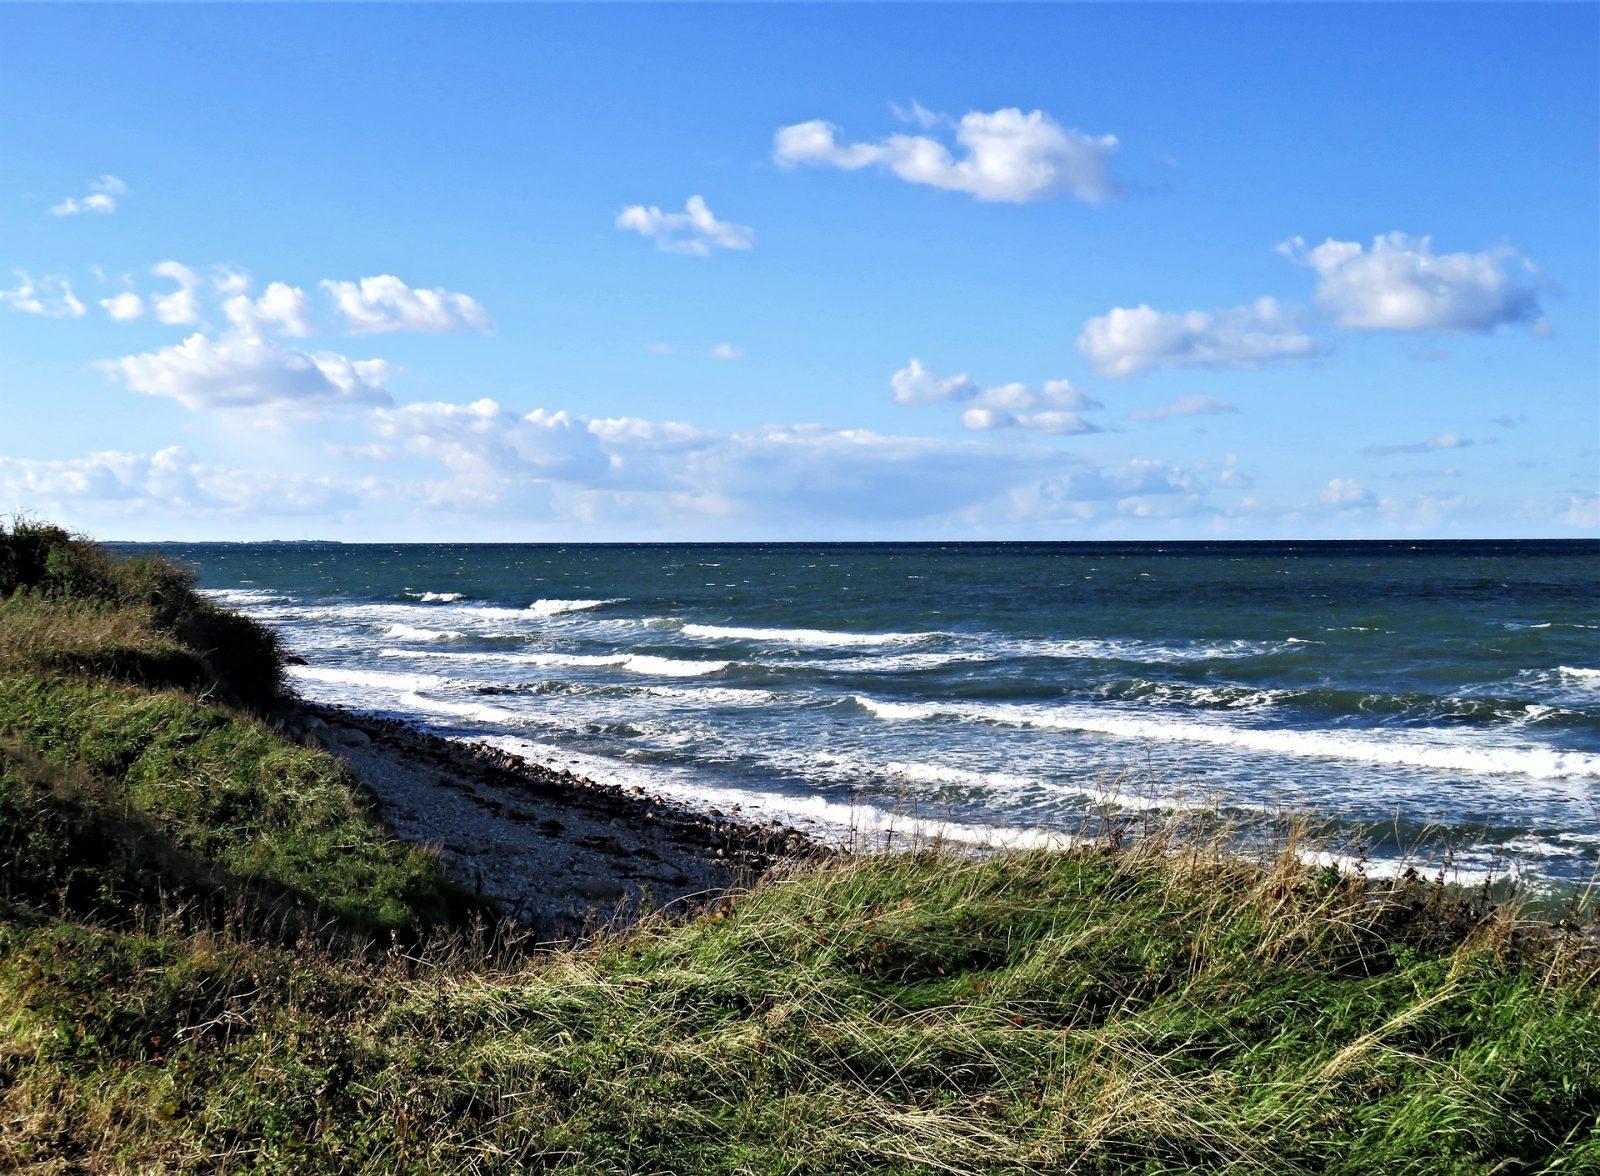 sea 3721325 1920 1 1600x1176 - Studia w Danii